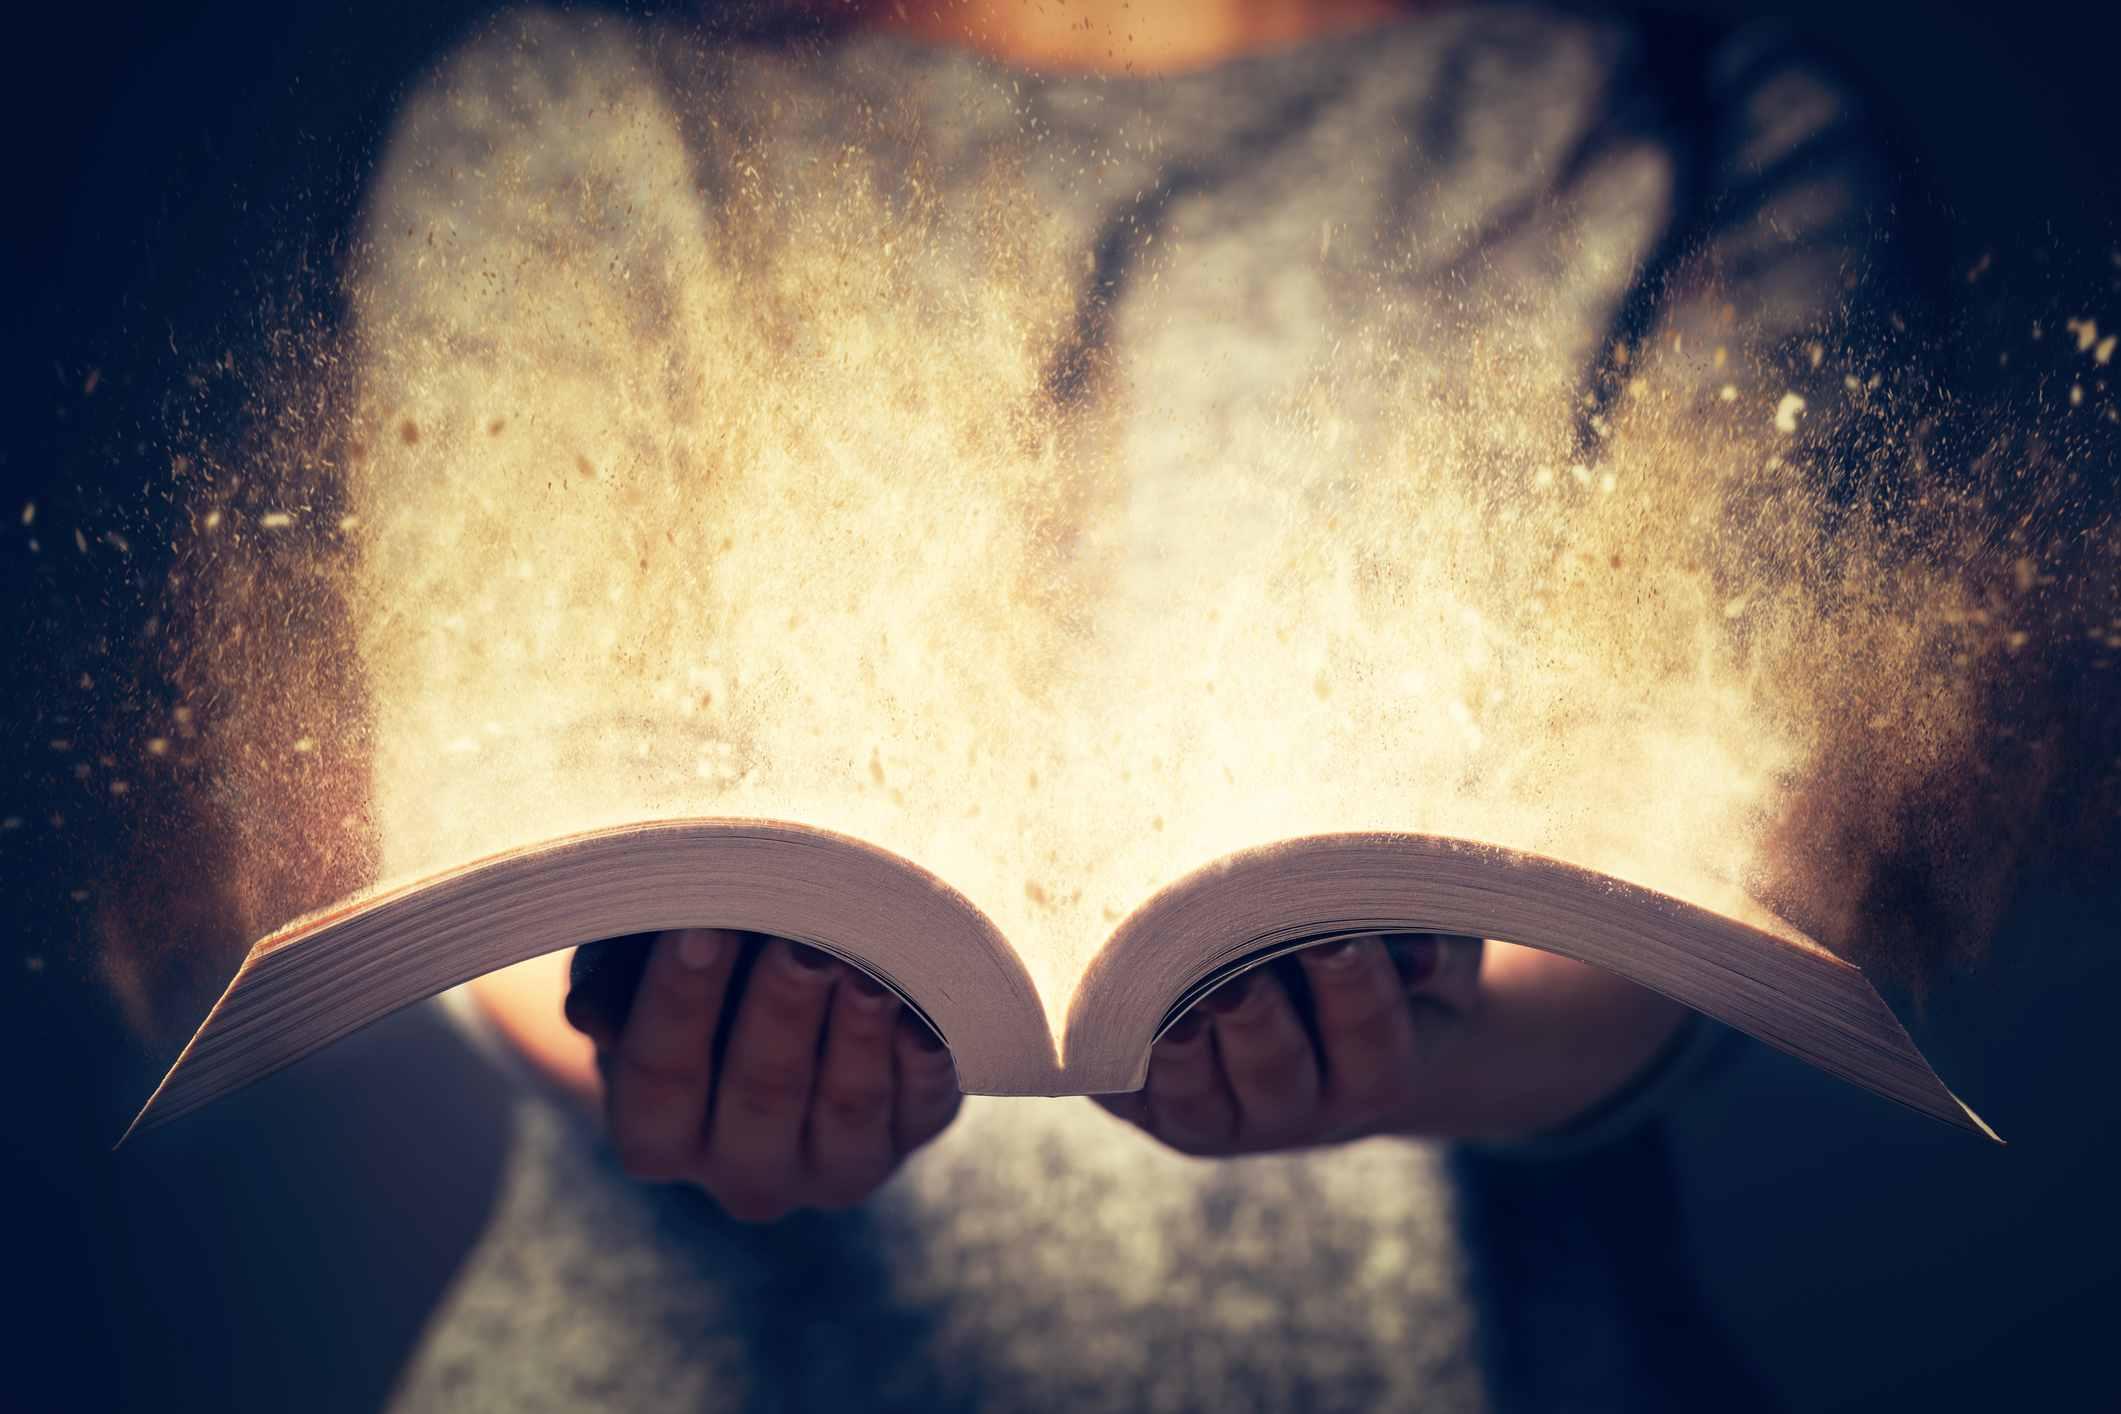 an open book bursting with light